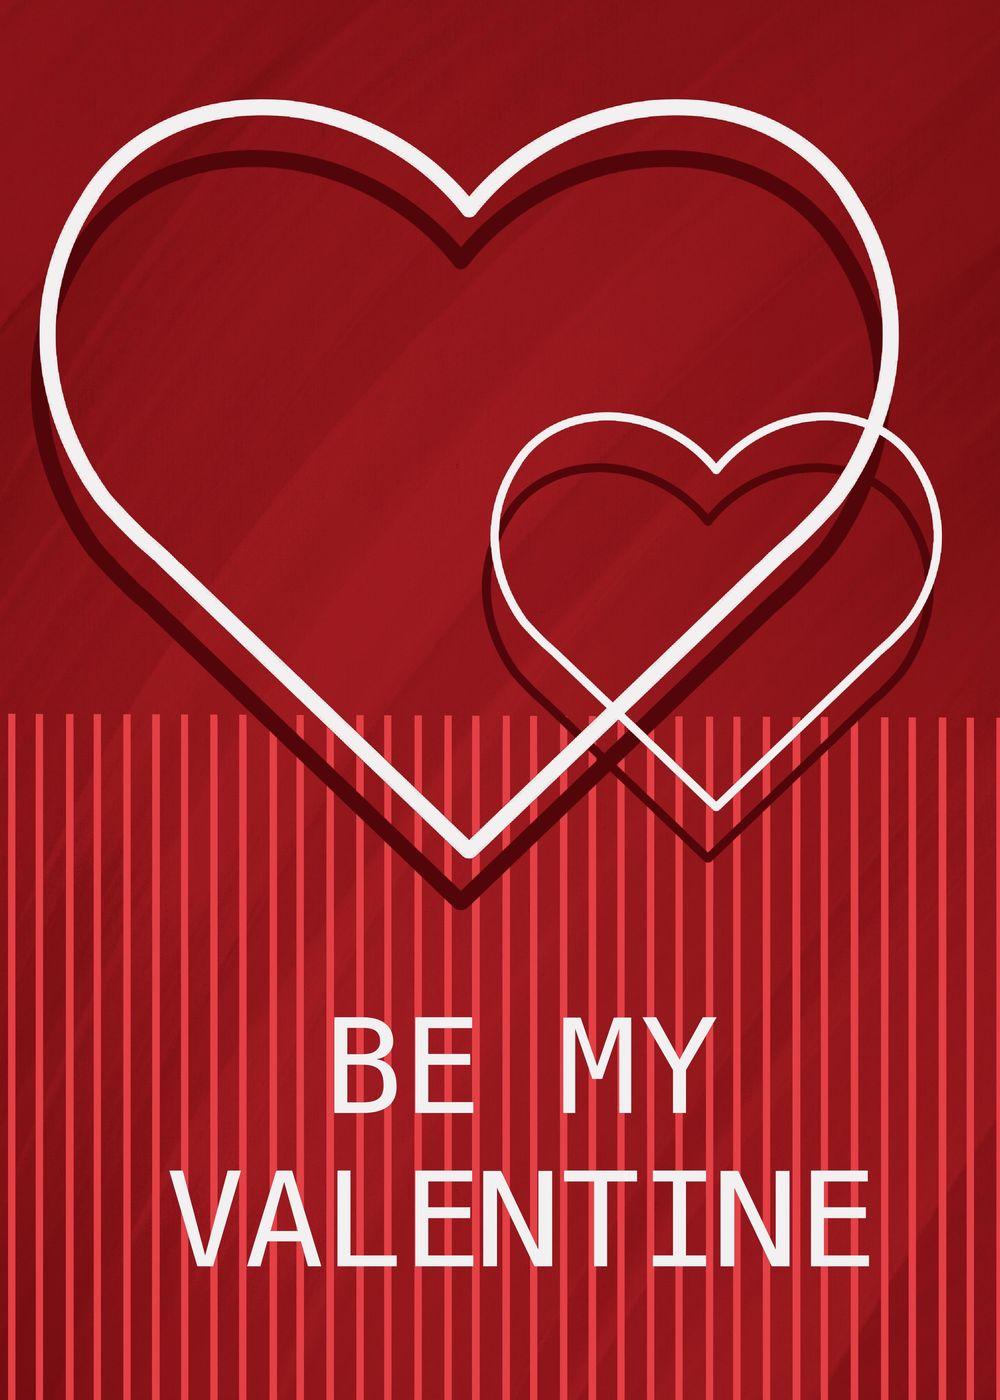 Valentine mood - image 2 - student project